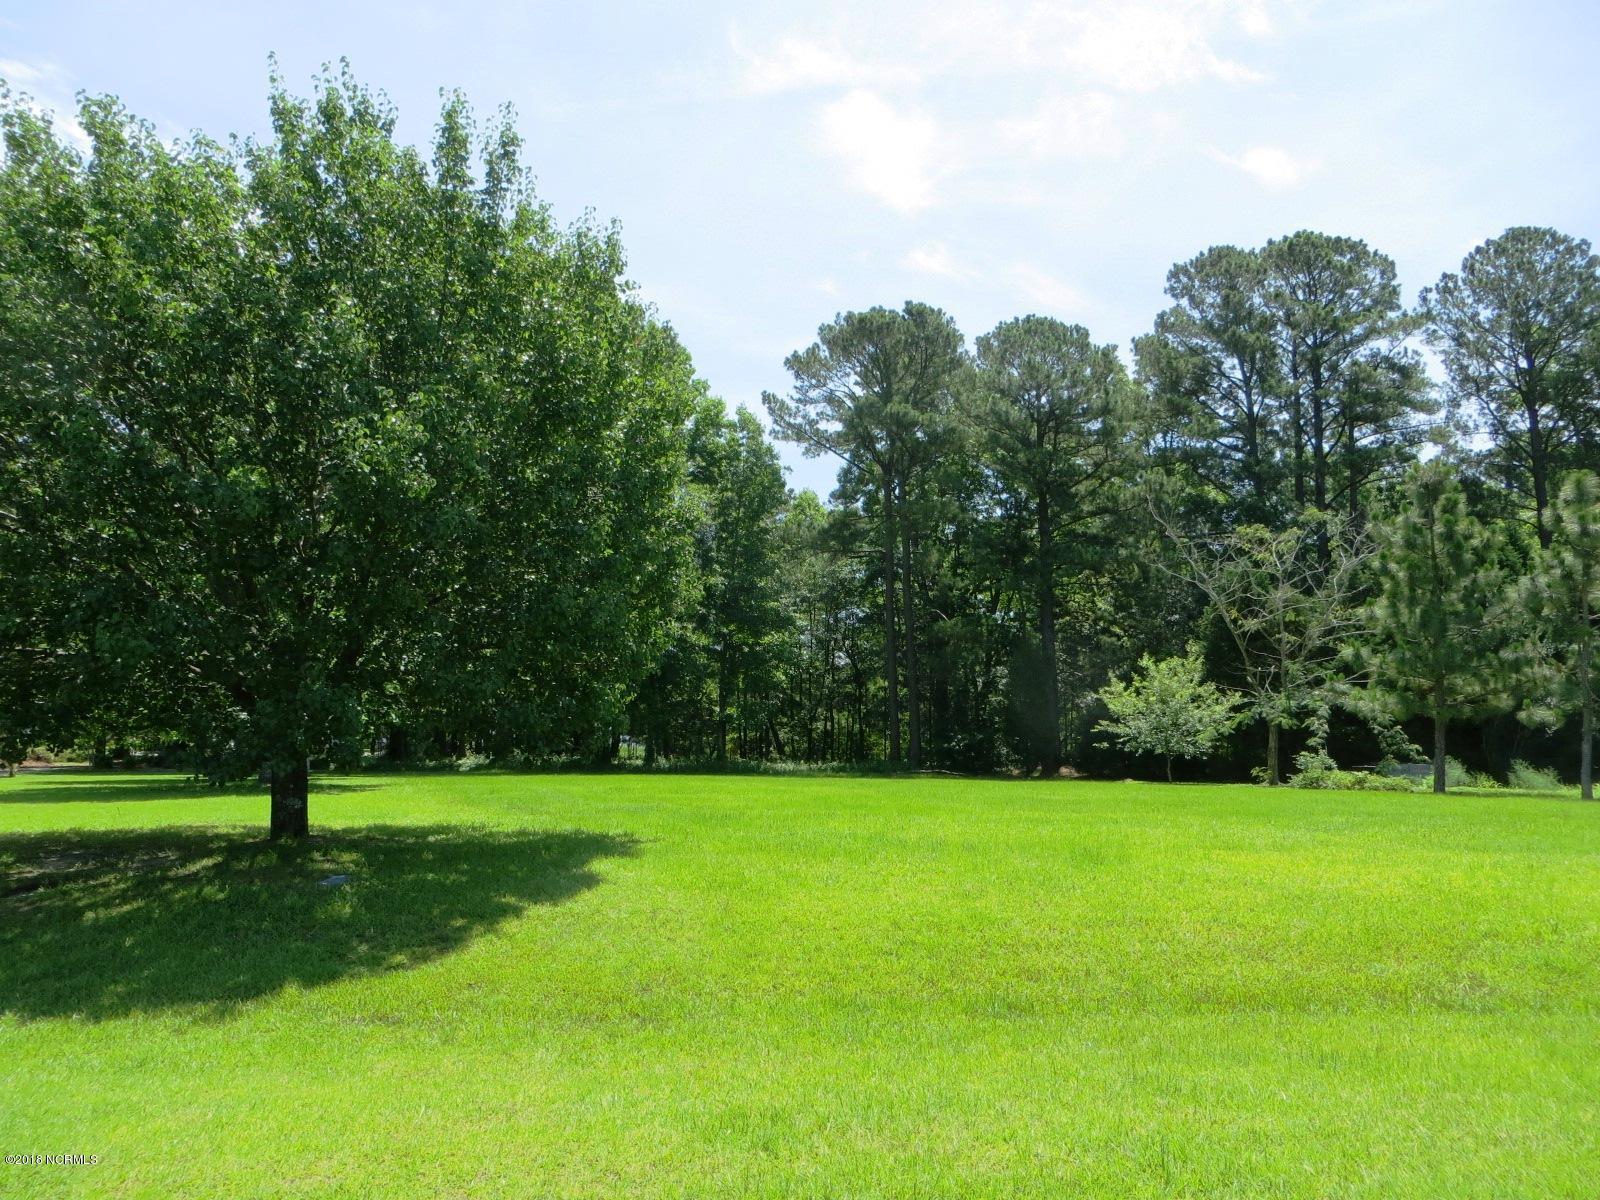 121 Spinnaker Lane, Havelock, North Carolina 28532, ,Residential land,For sale,Spinnaker,100119414